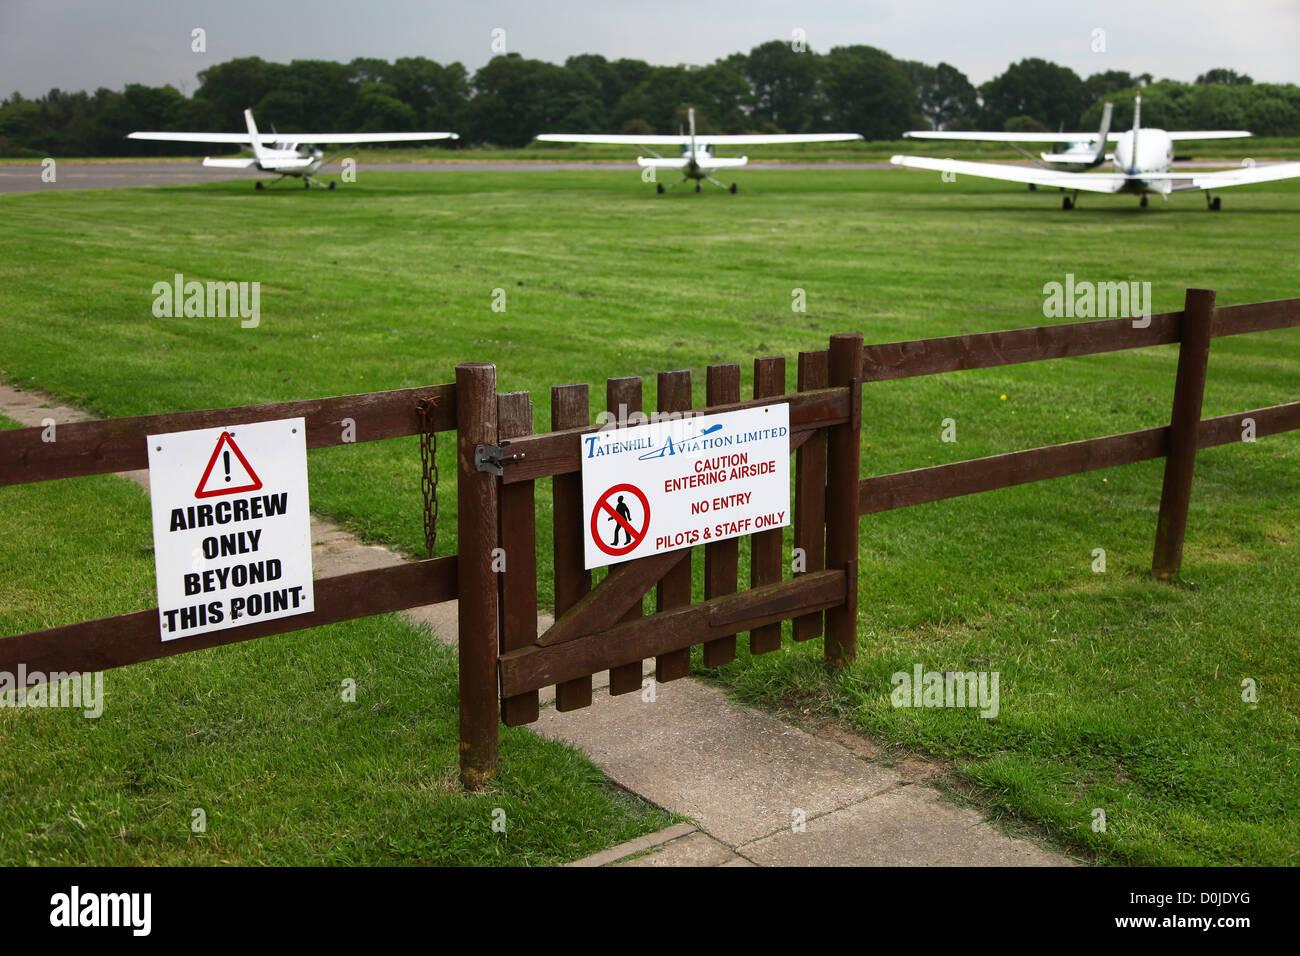 Small planes at Tatenhill airfield aerodrome near to Burton upon Trent Staffordshire Staffs England UK - Stock Image